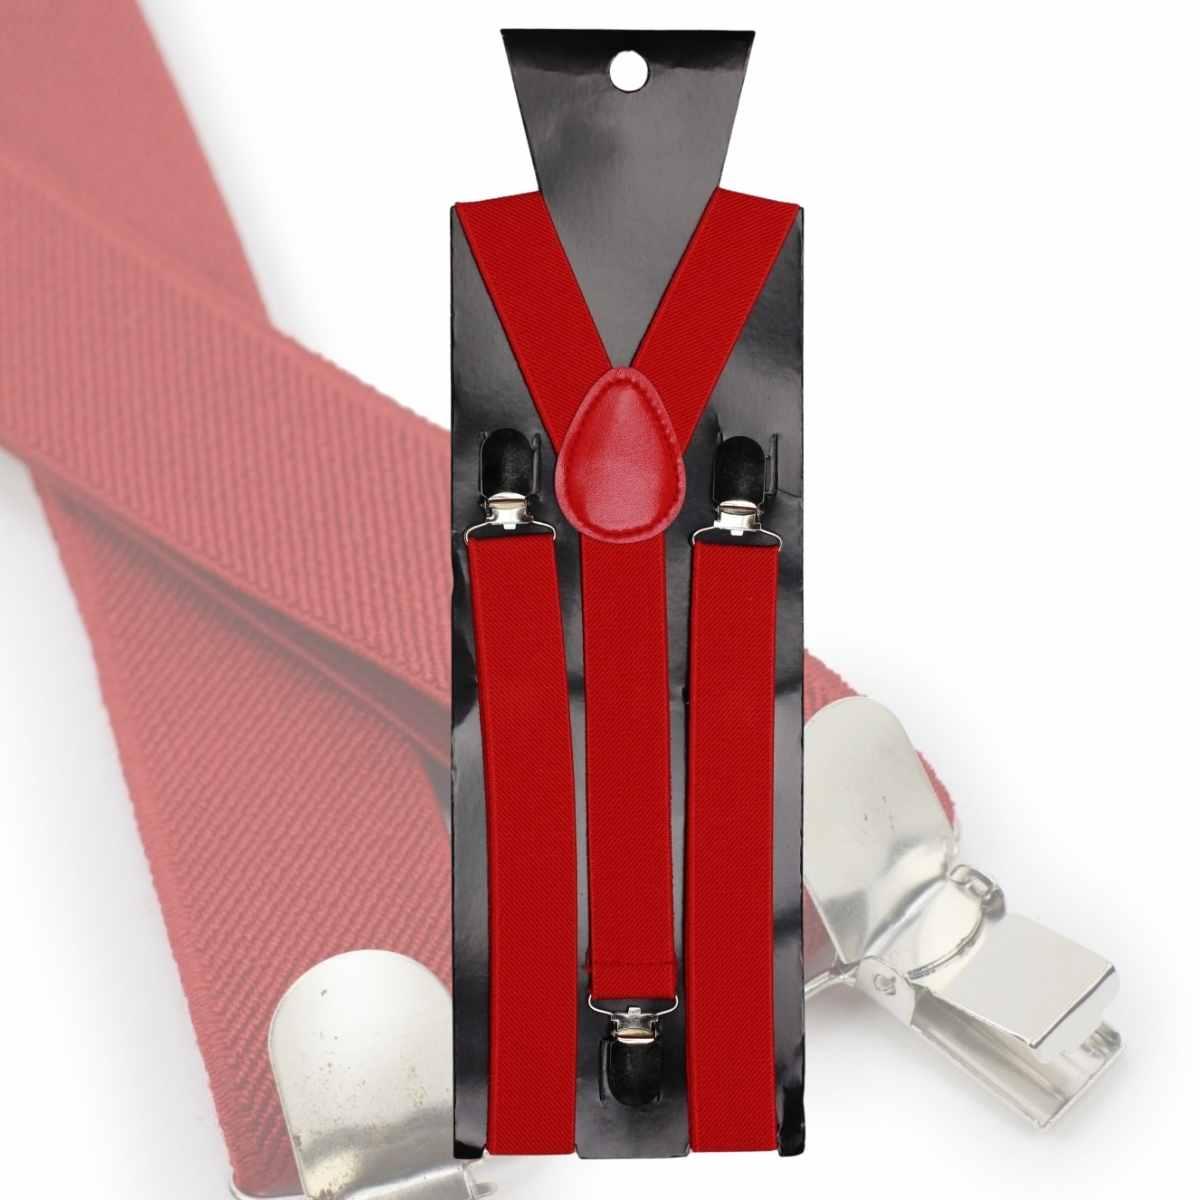 Kit Diabinha (Saia de Tule Vermelha Adulta + Kit Diabinha Paete + Suspensório Vermelho)